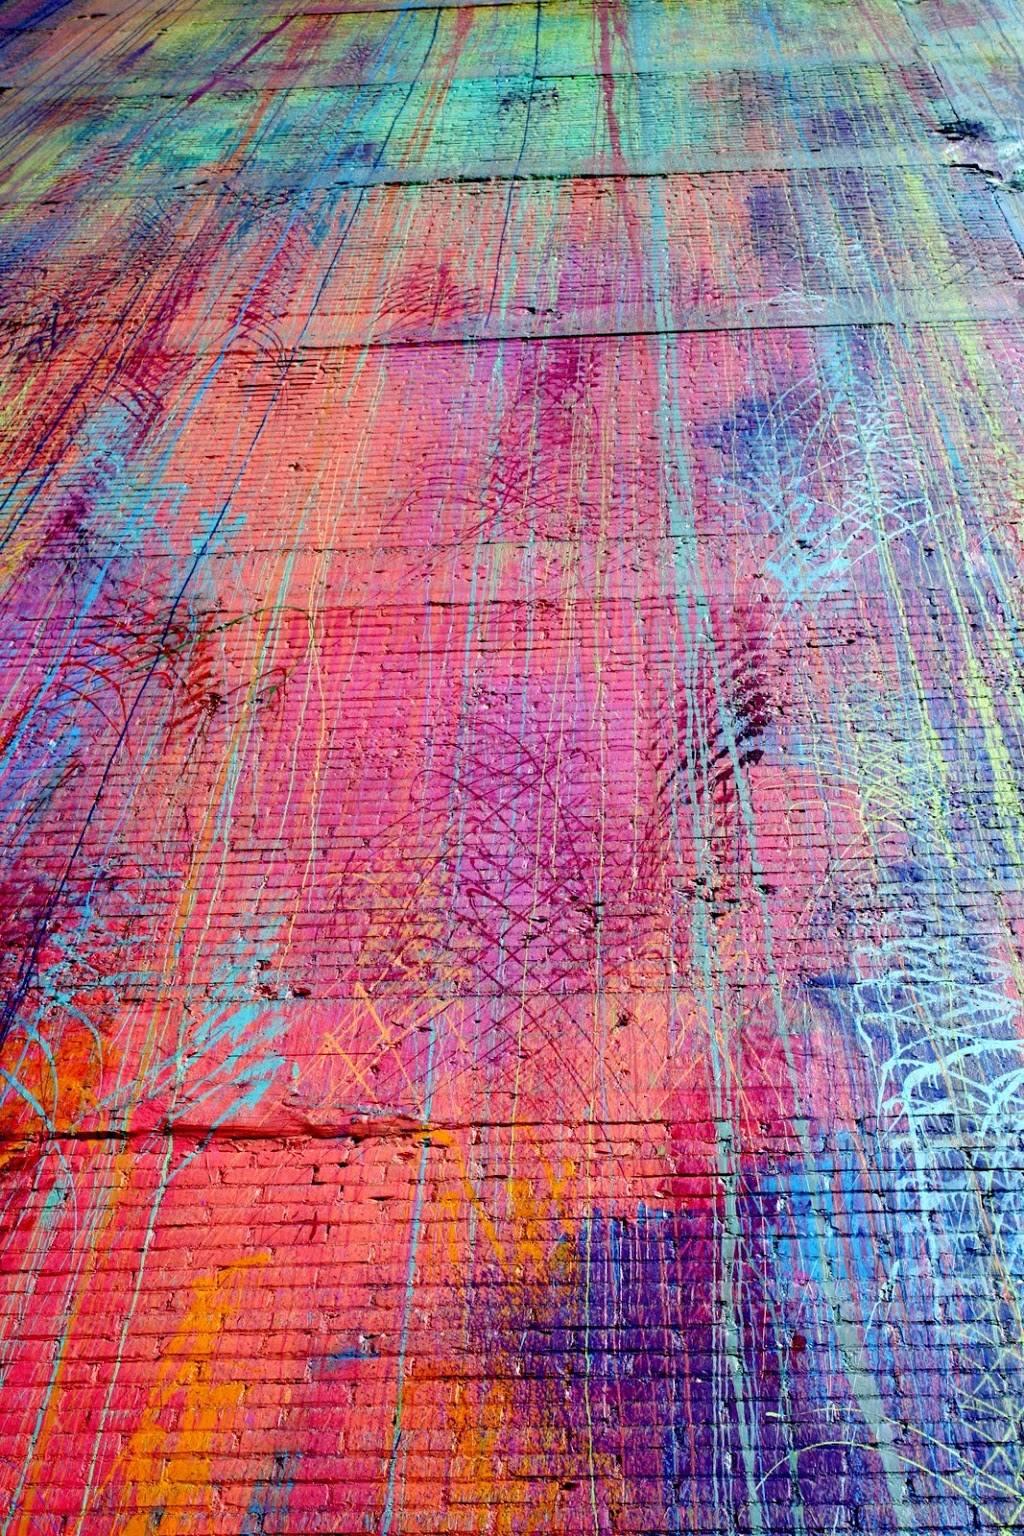 The Illuminated Mural - museum  | Photo 4 of 10 | Address: 2967 E Grand Blvd, Detroit, MI 48202, USA | Phone: (248) 885-4156